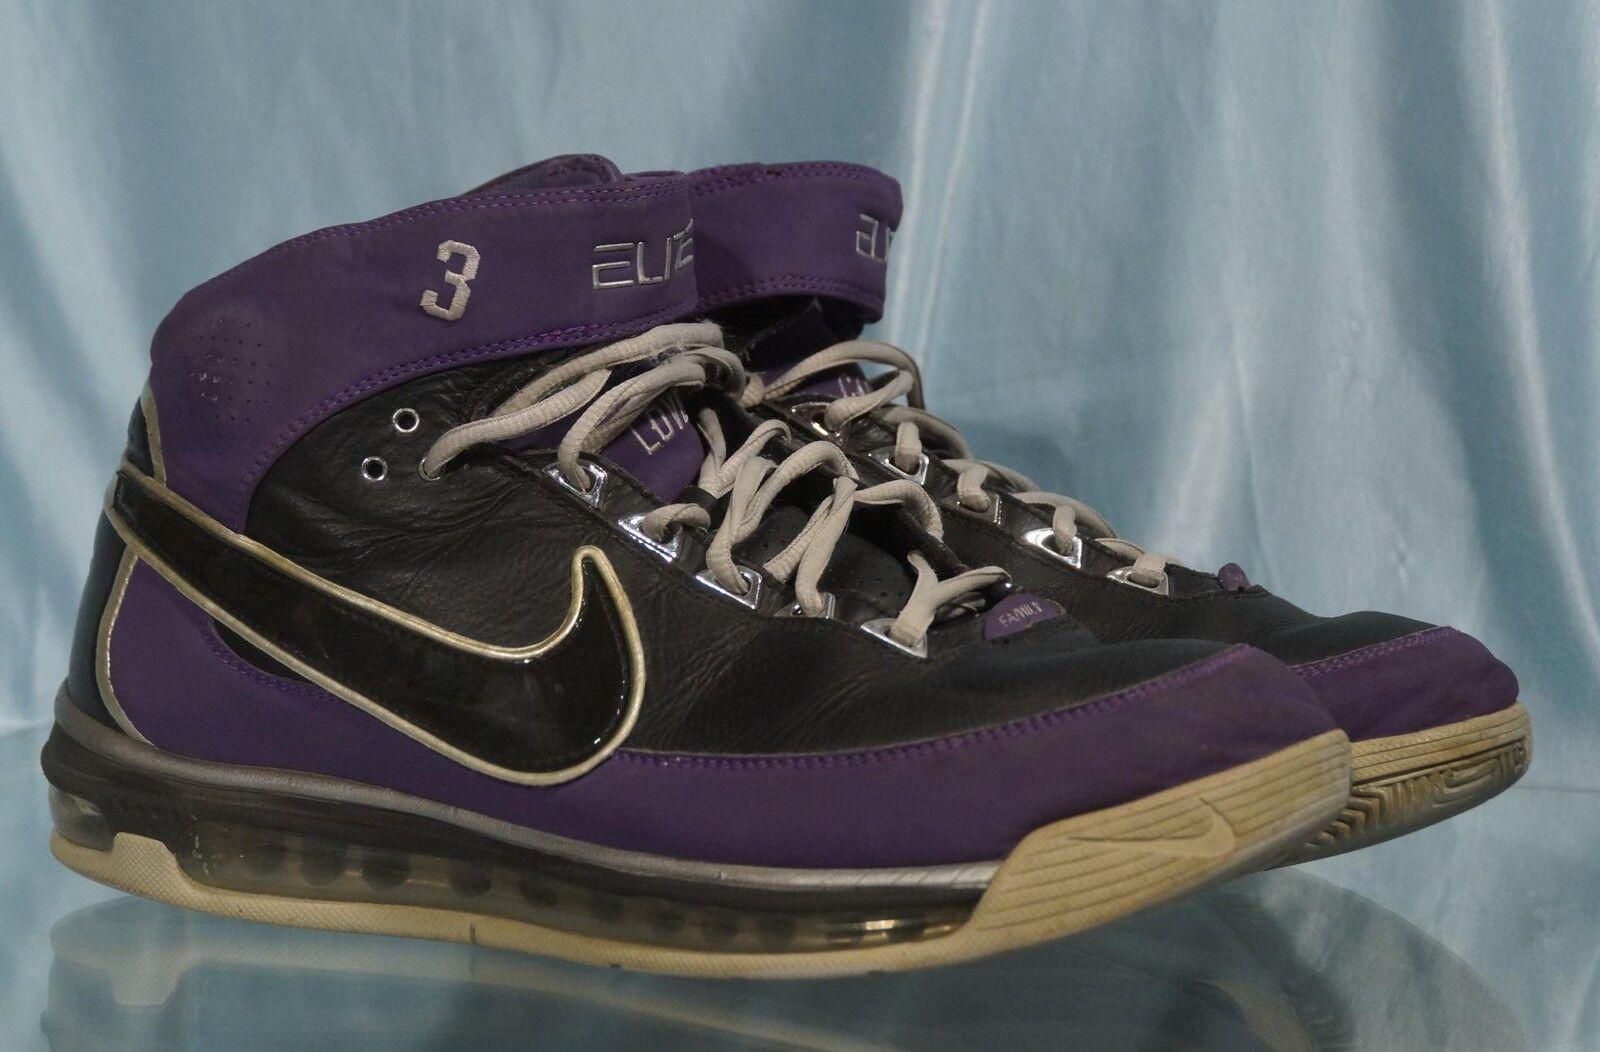 Nice Purple & Black NIKE ELITE 3 FORCE  Basketball Low Top Shoes Sz 10.5